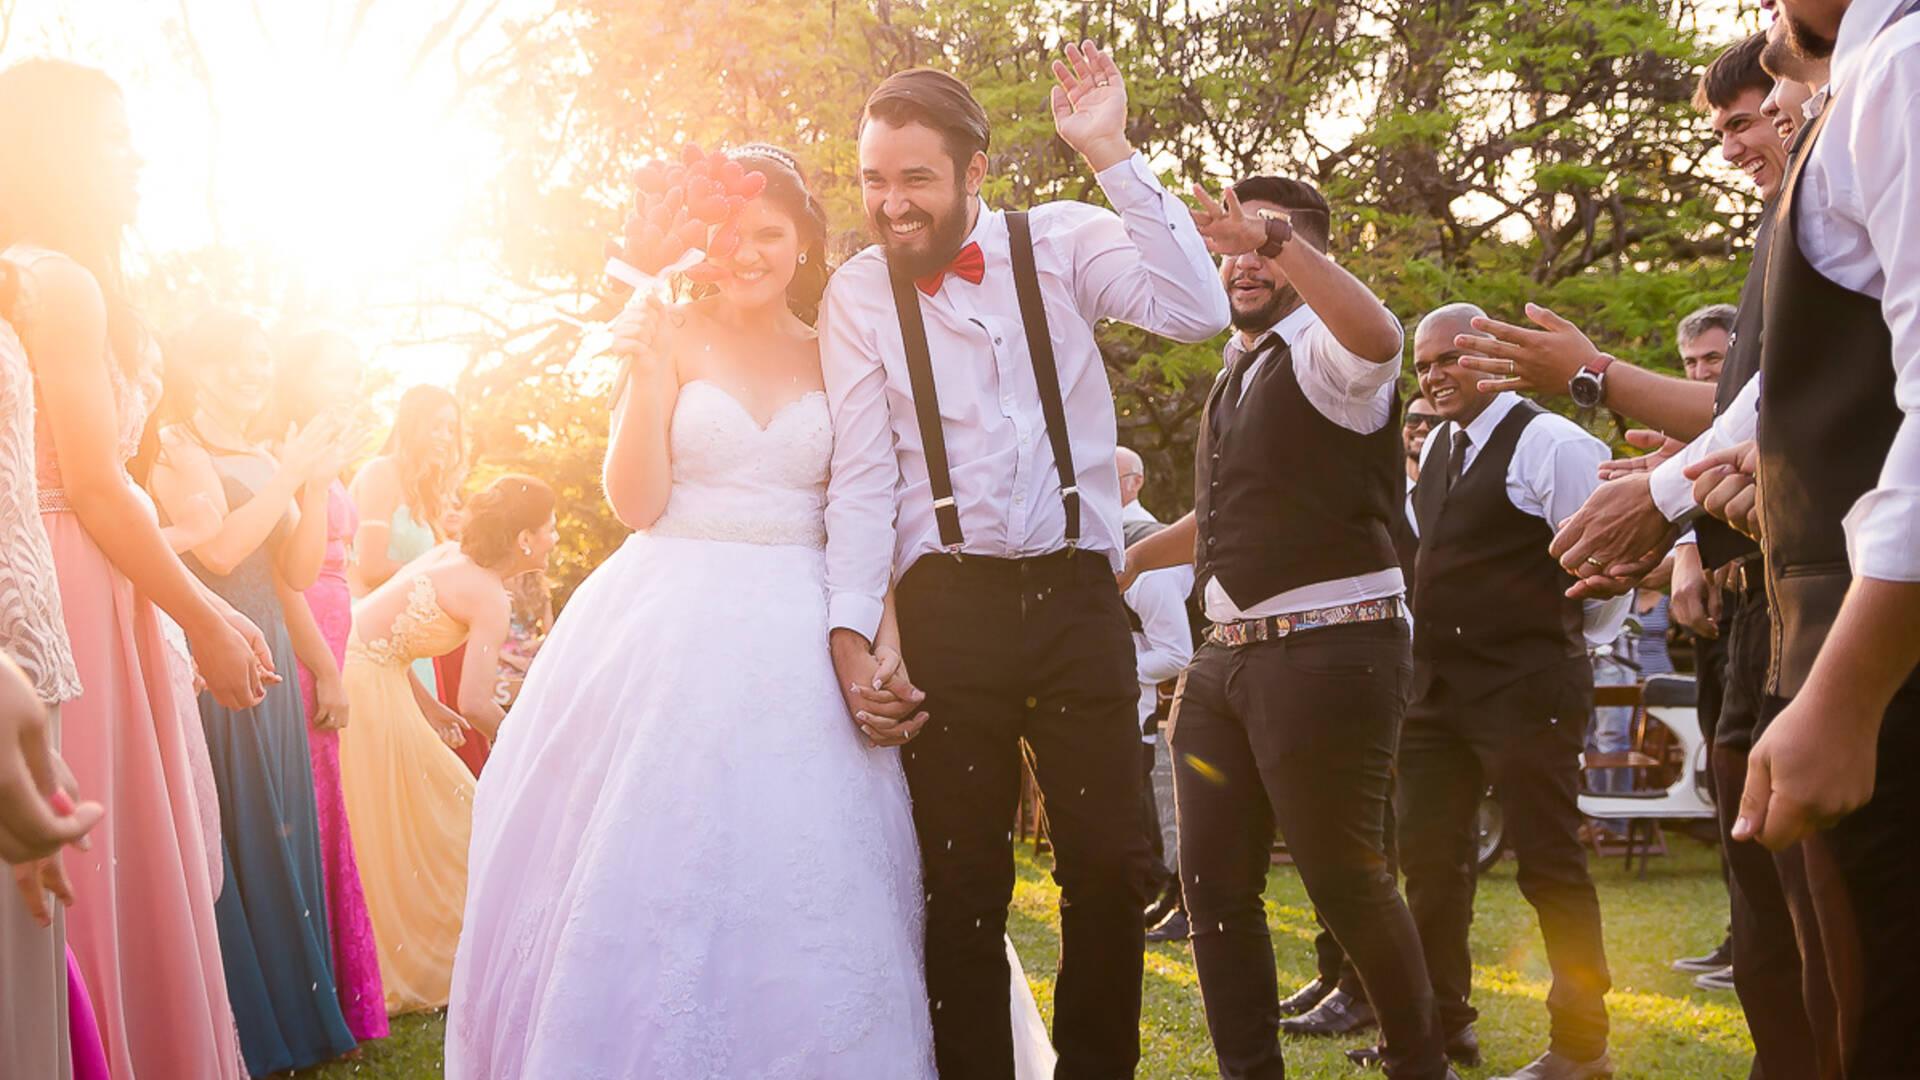 de Wedding